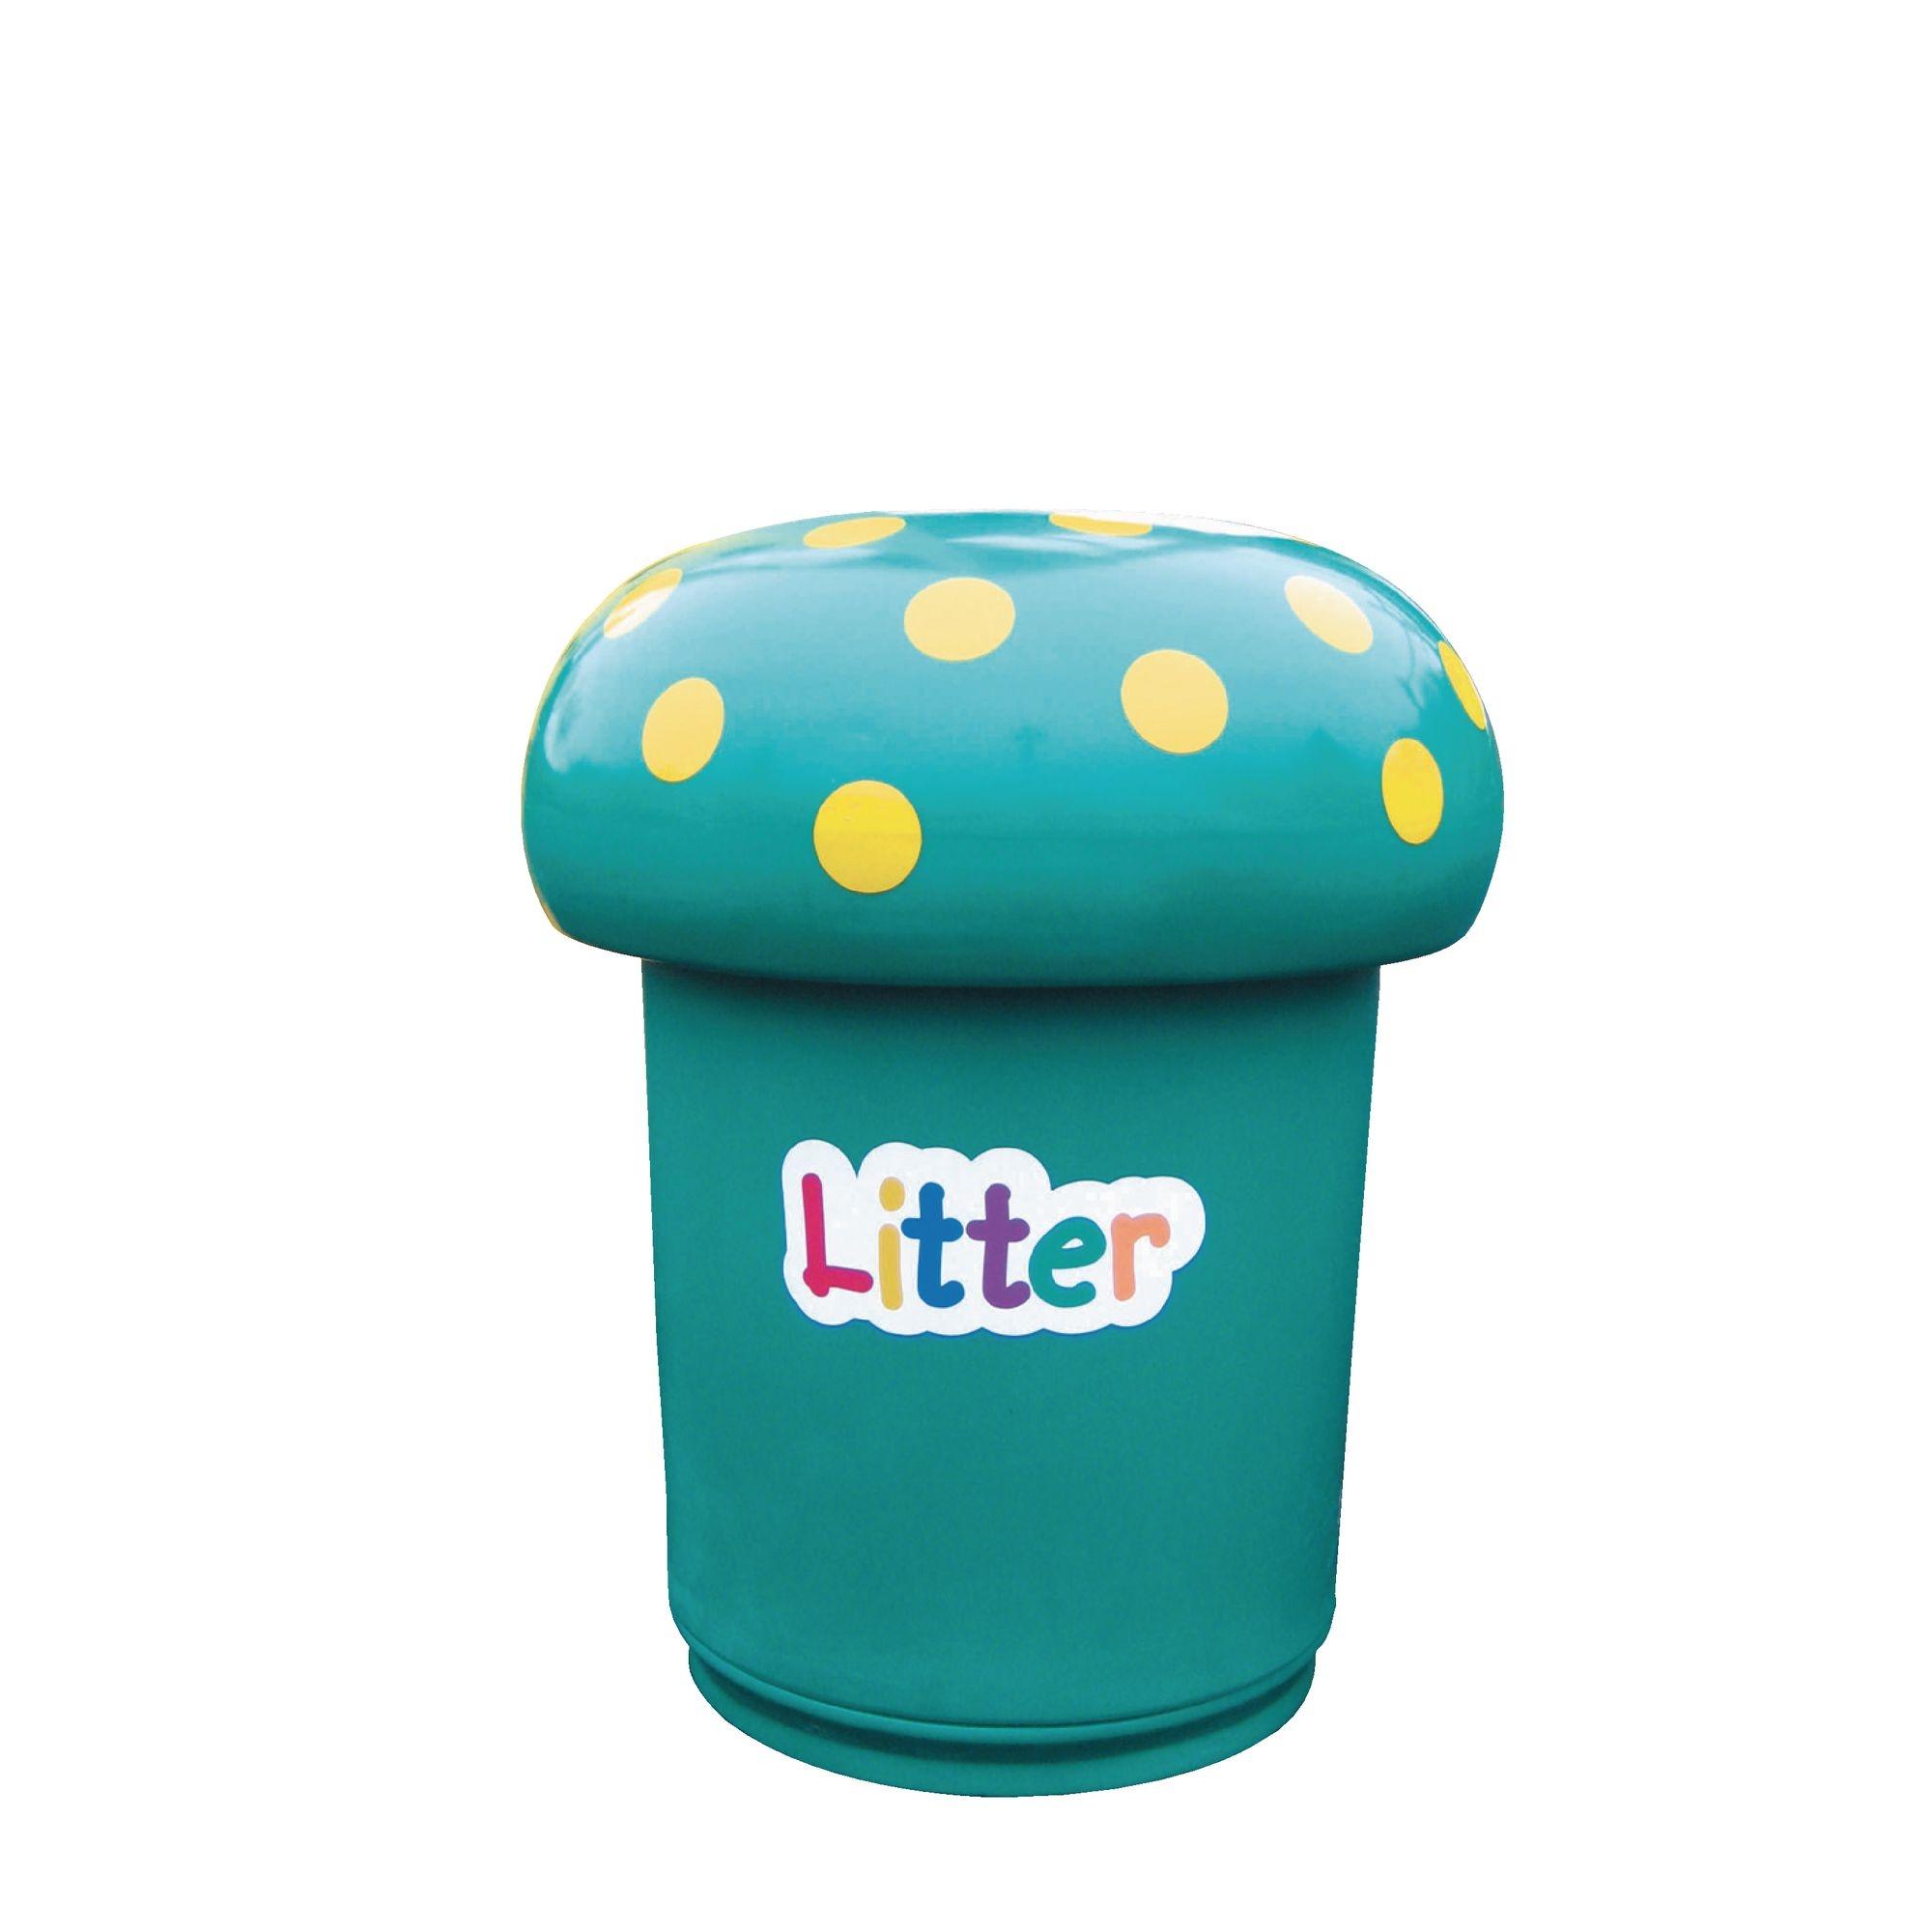 Mushroom Litter Bins Litter Label Green